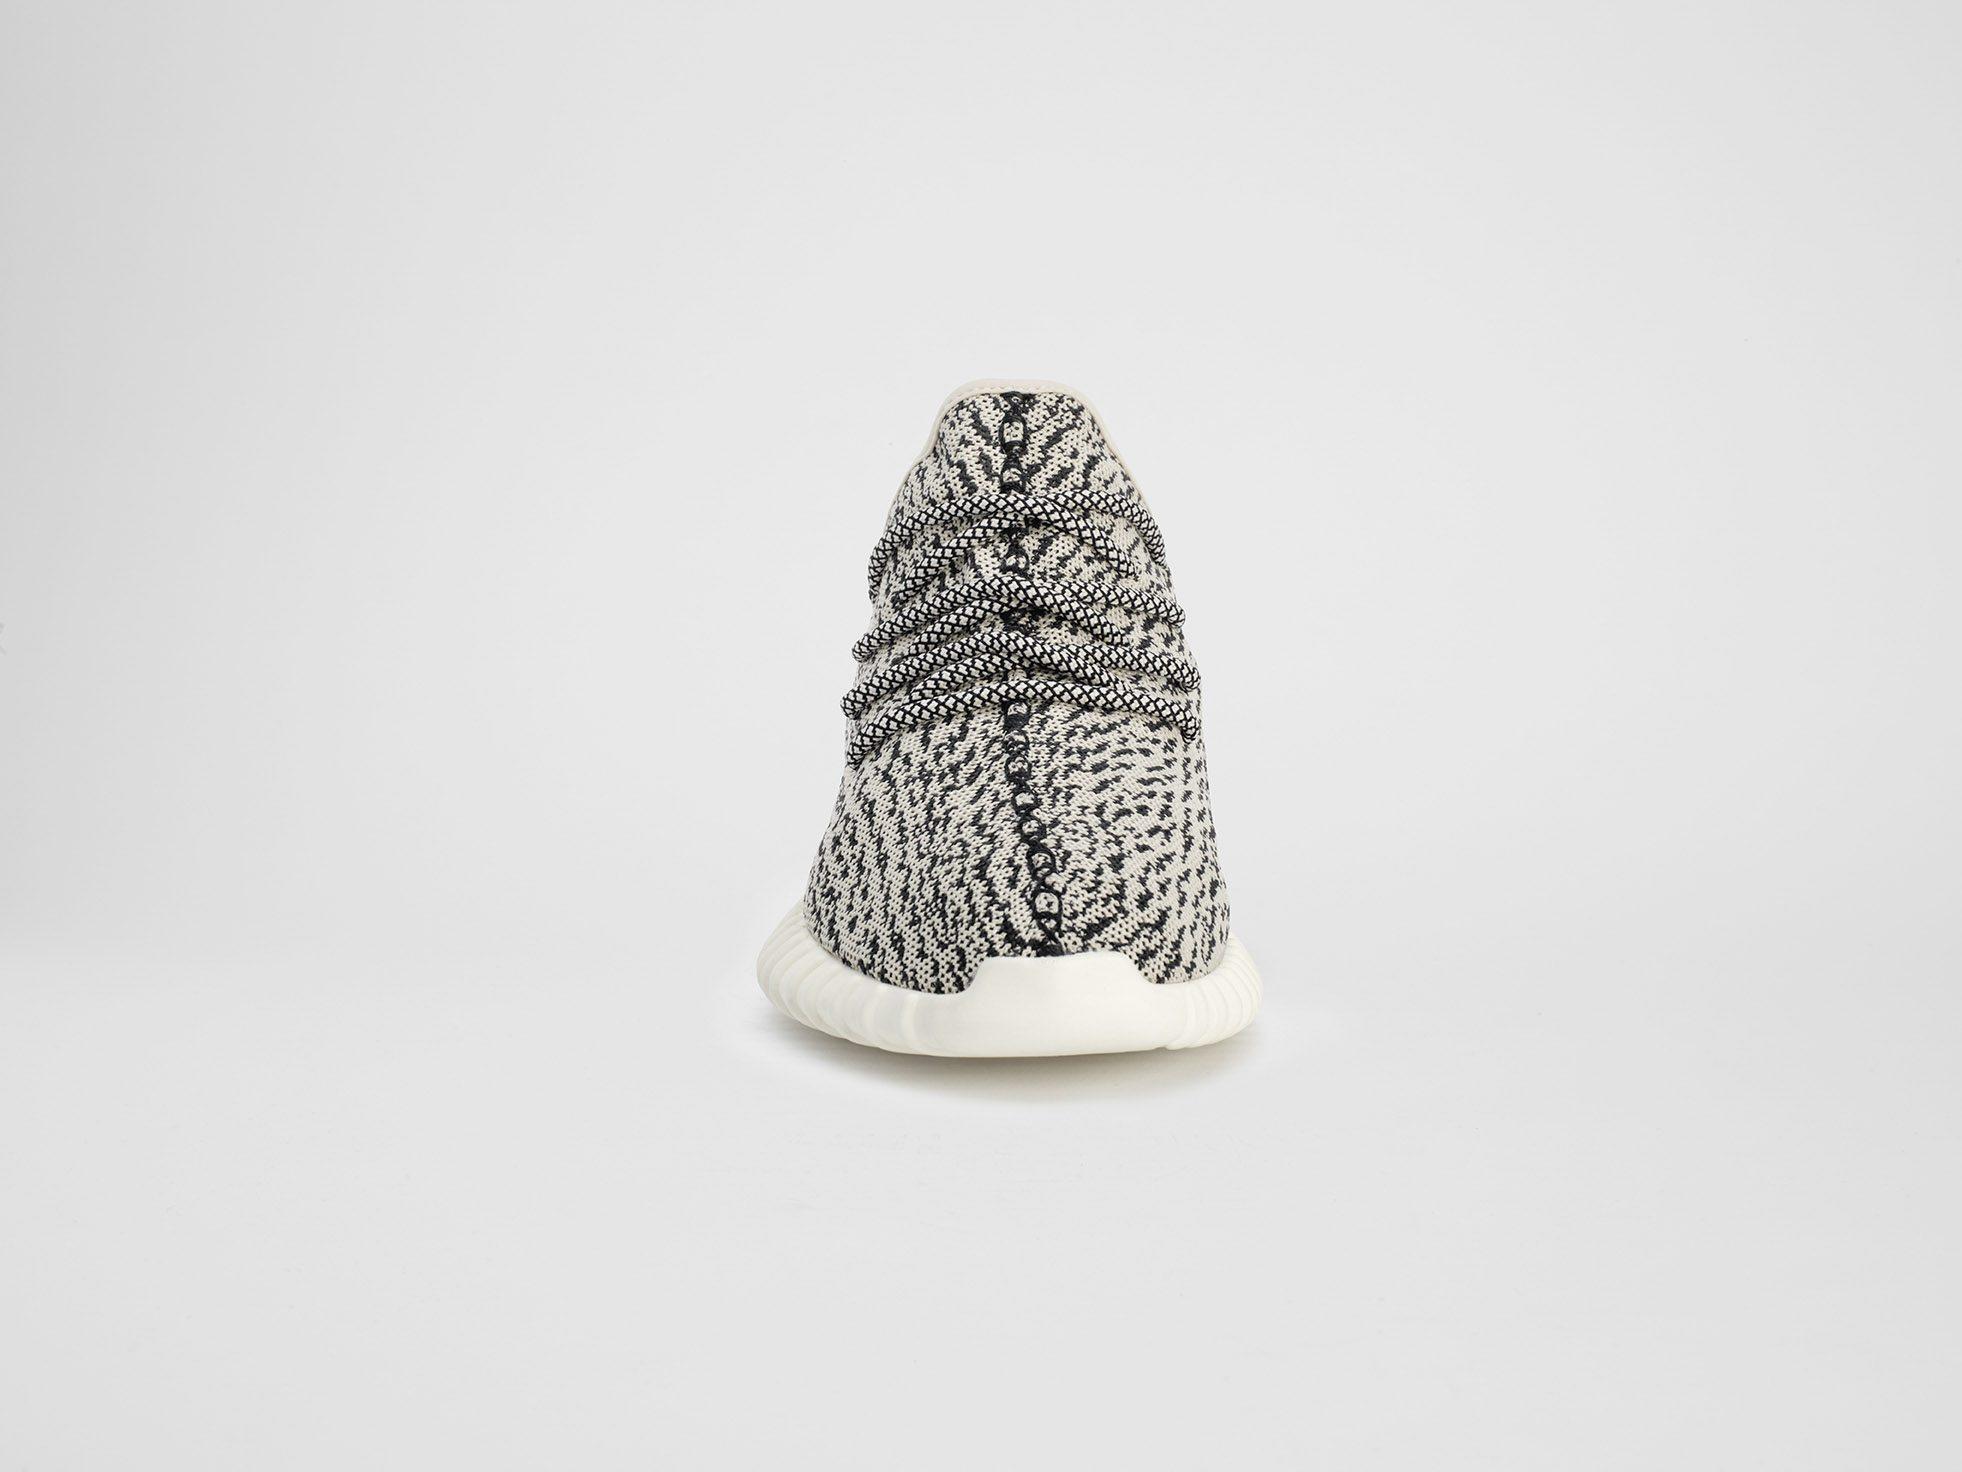 Kanye West x adidas Originals Yeezy Boost 350 4